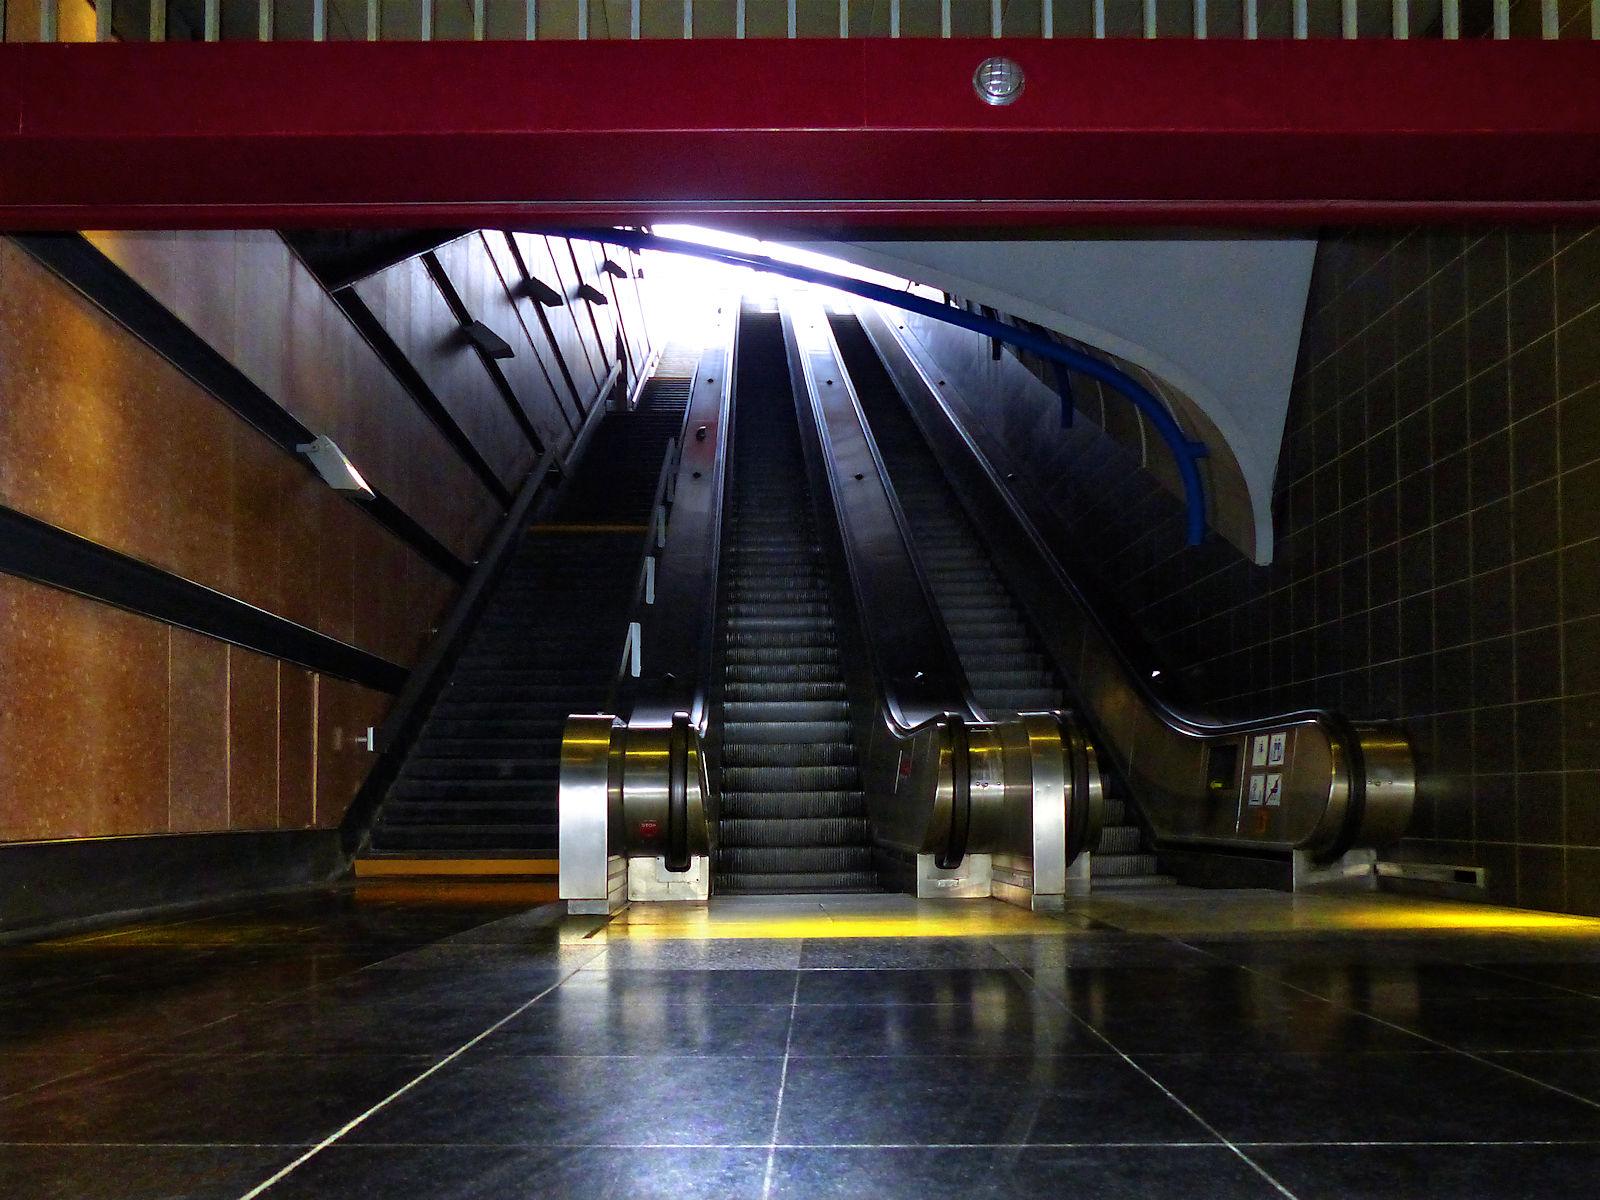 Métro Mercure, Tourcoing - Escalators